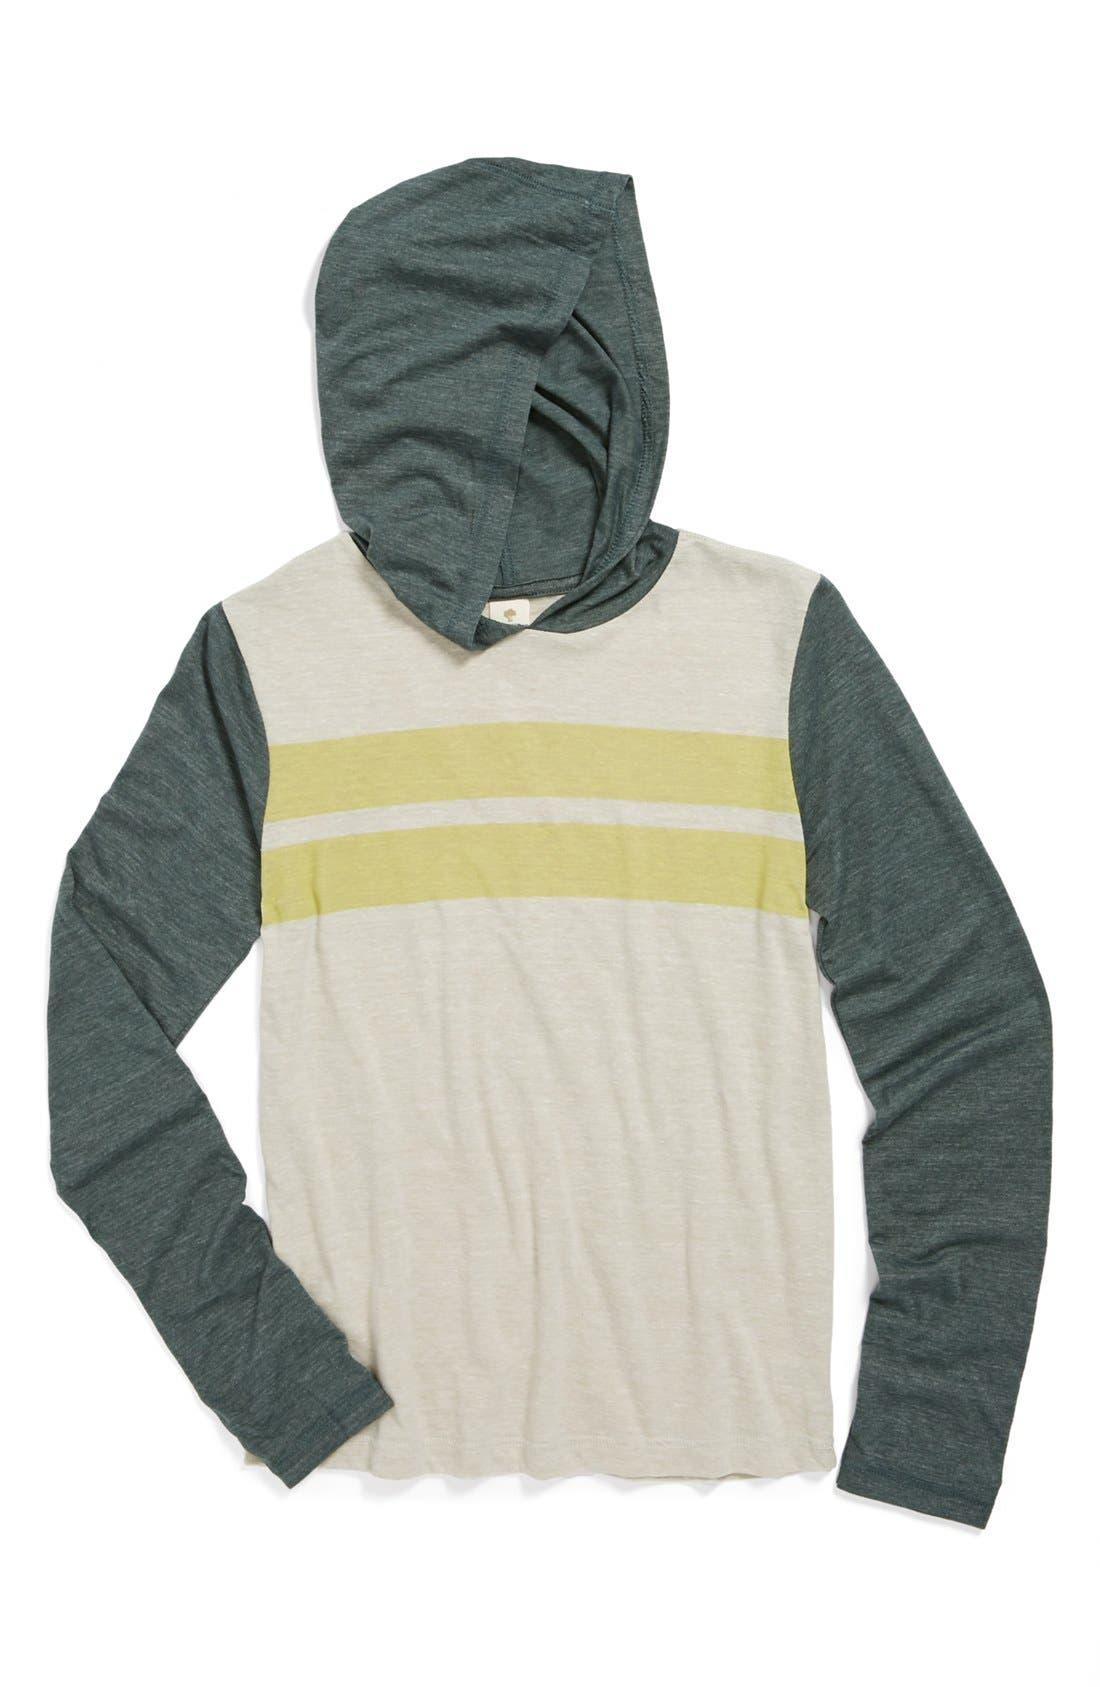 Alternate Image 1 Selected - Tucker + Tate 'Halsten' Hooded T-Shirt (Big Boys)